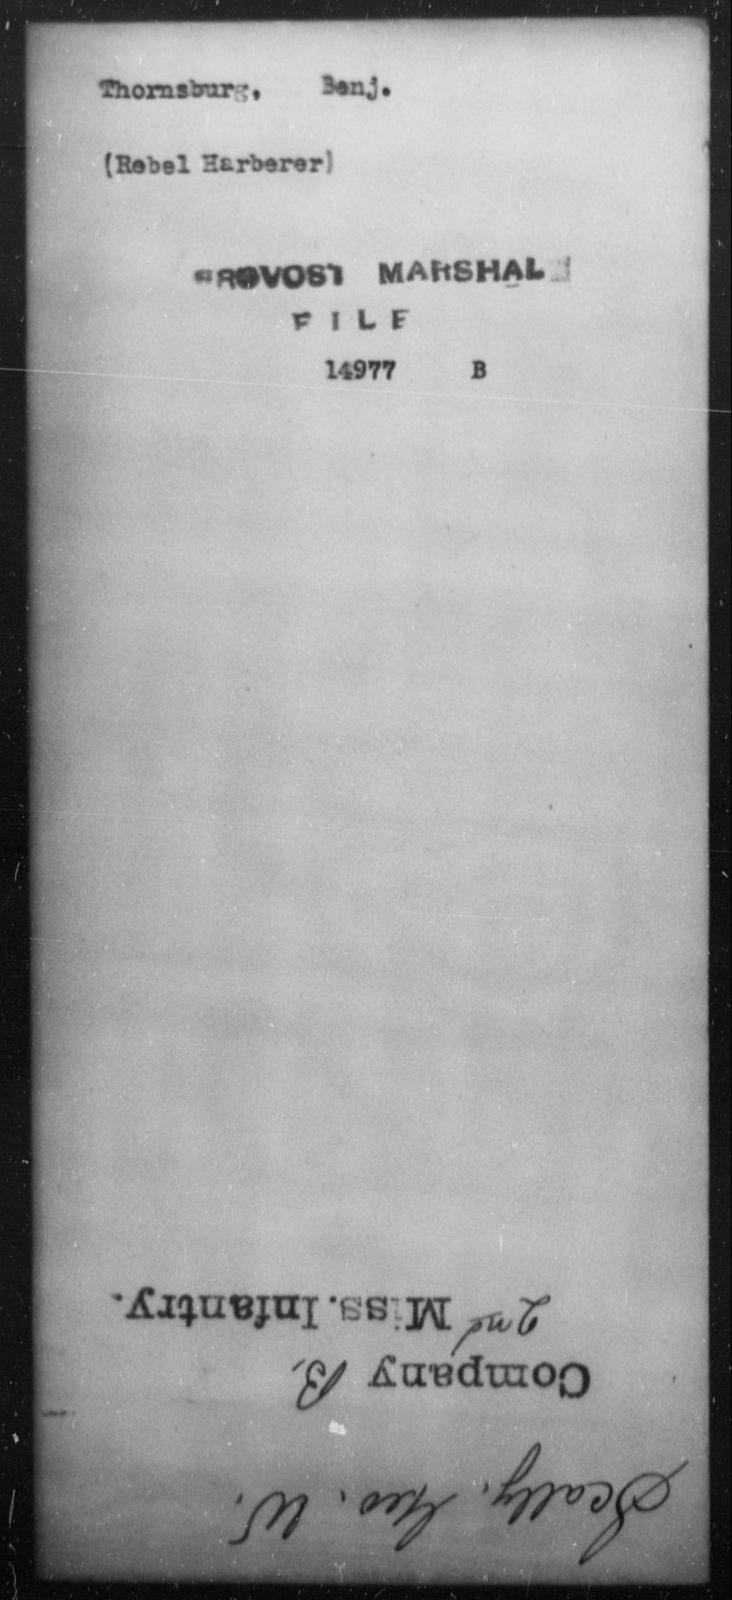 Thornsburg, Benj - State: [Blank] - Year: [Blank]